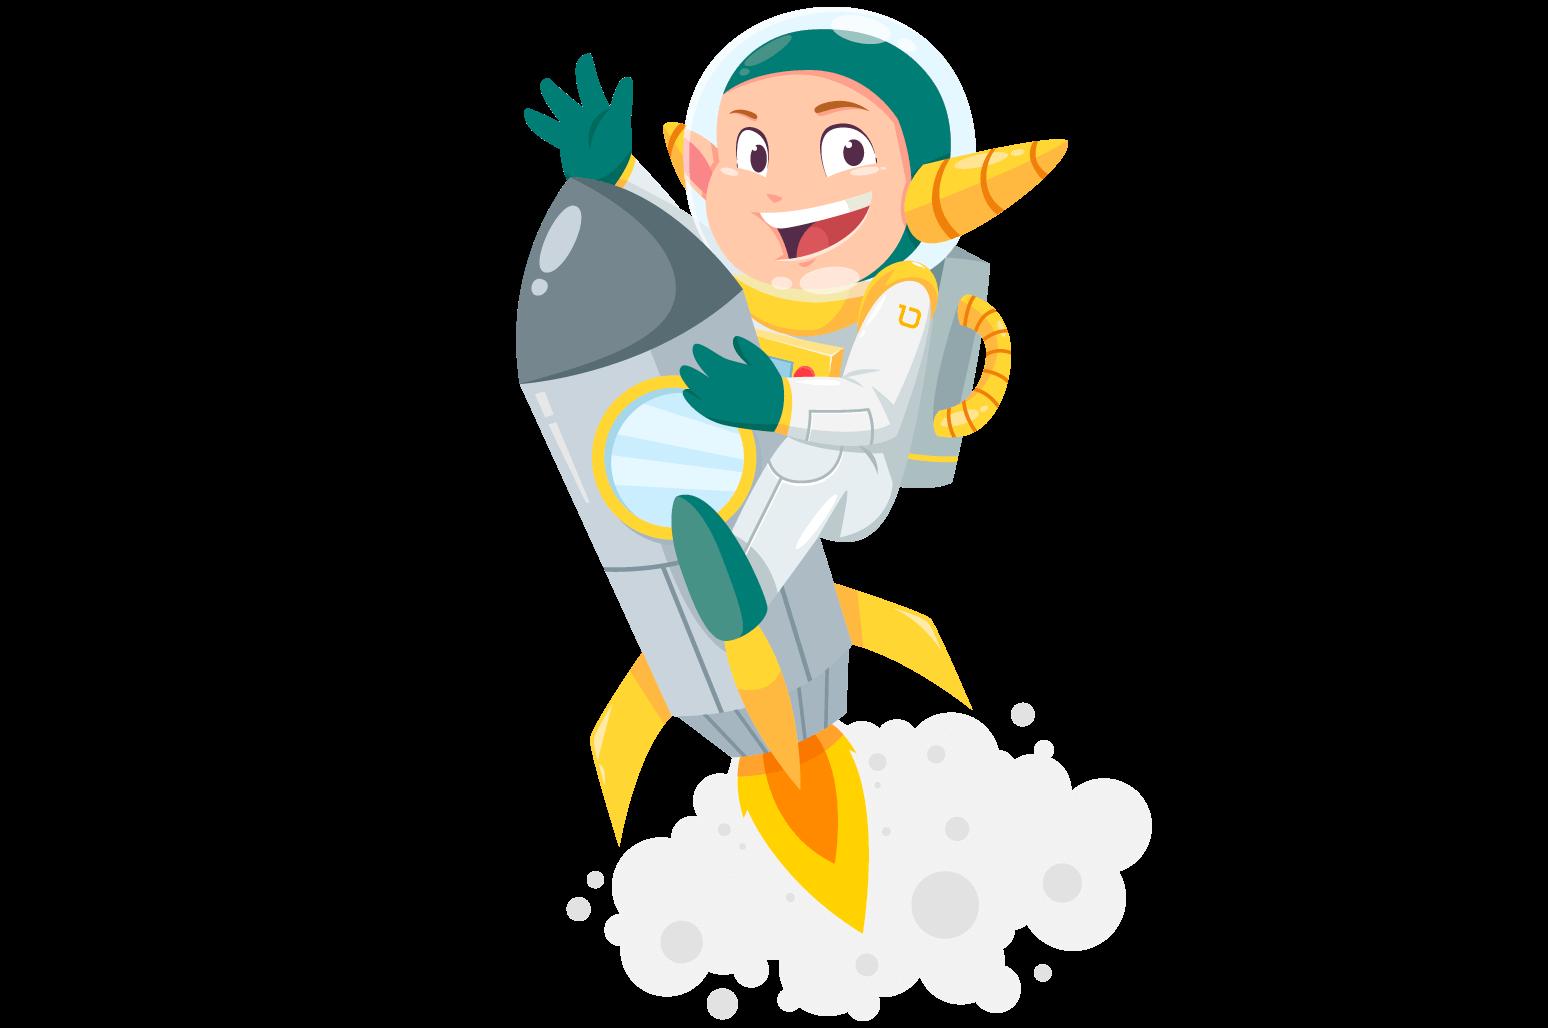 Illustration of an elf riding a rocket